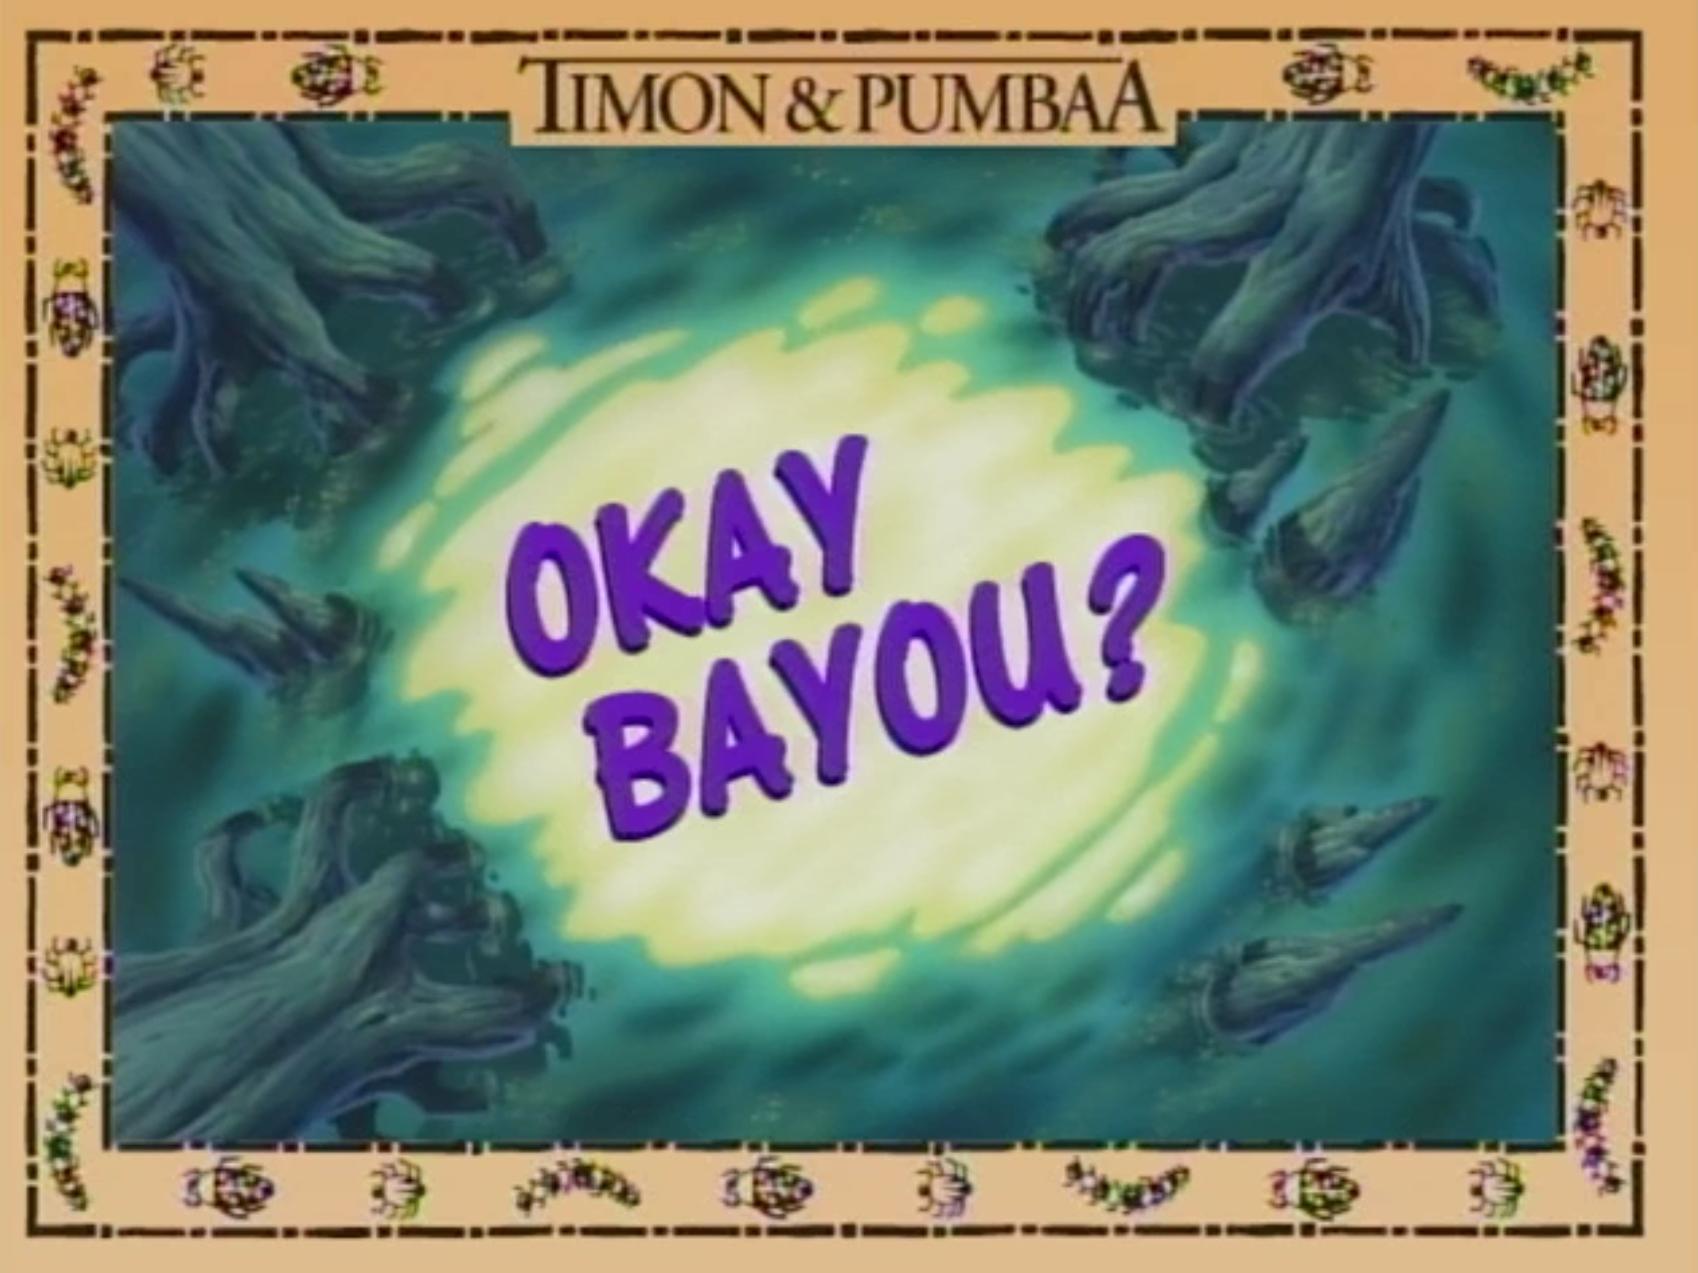 Okay Bayou?